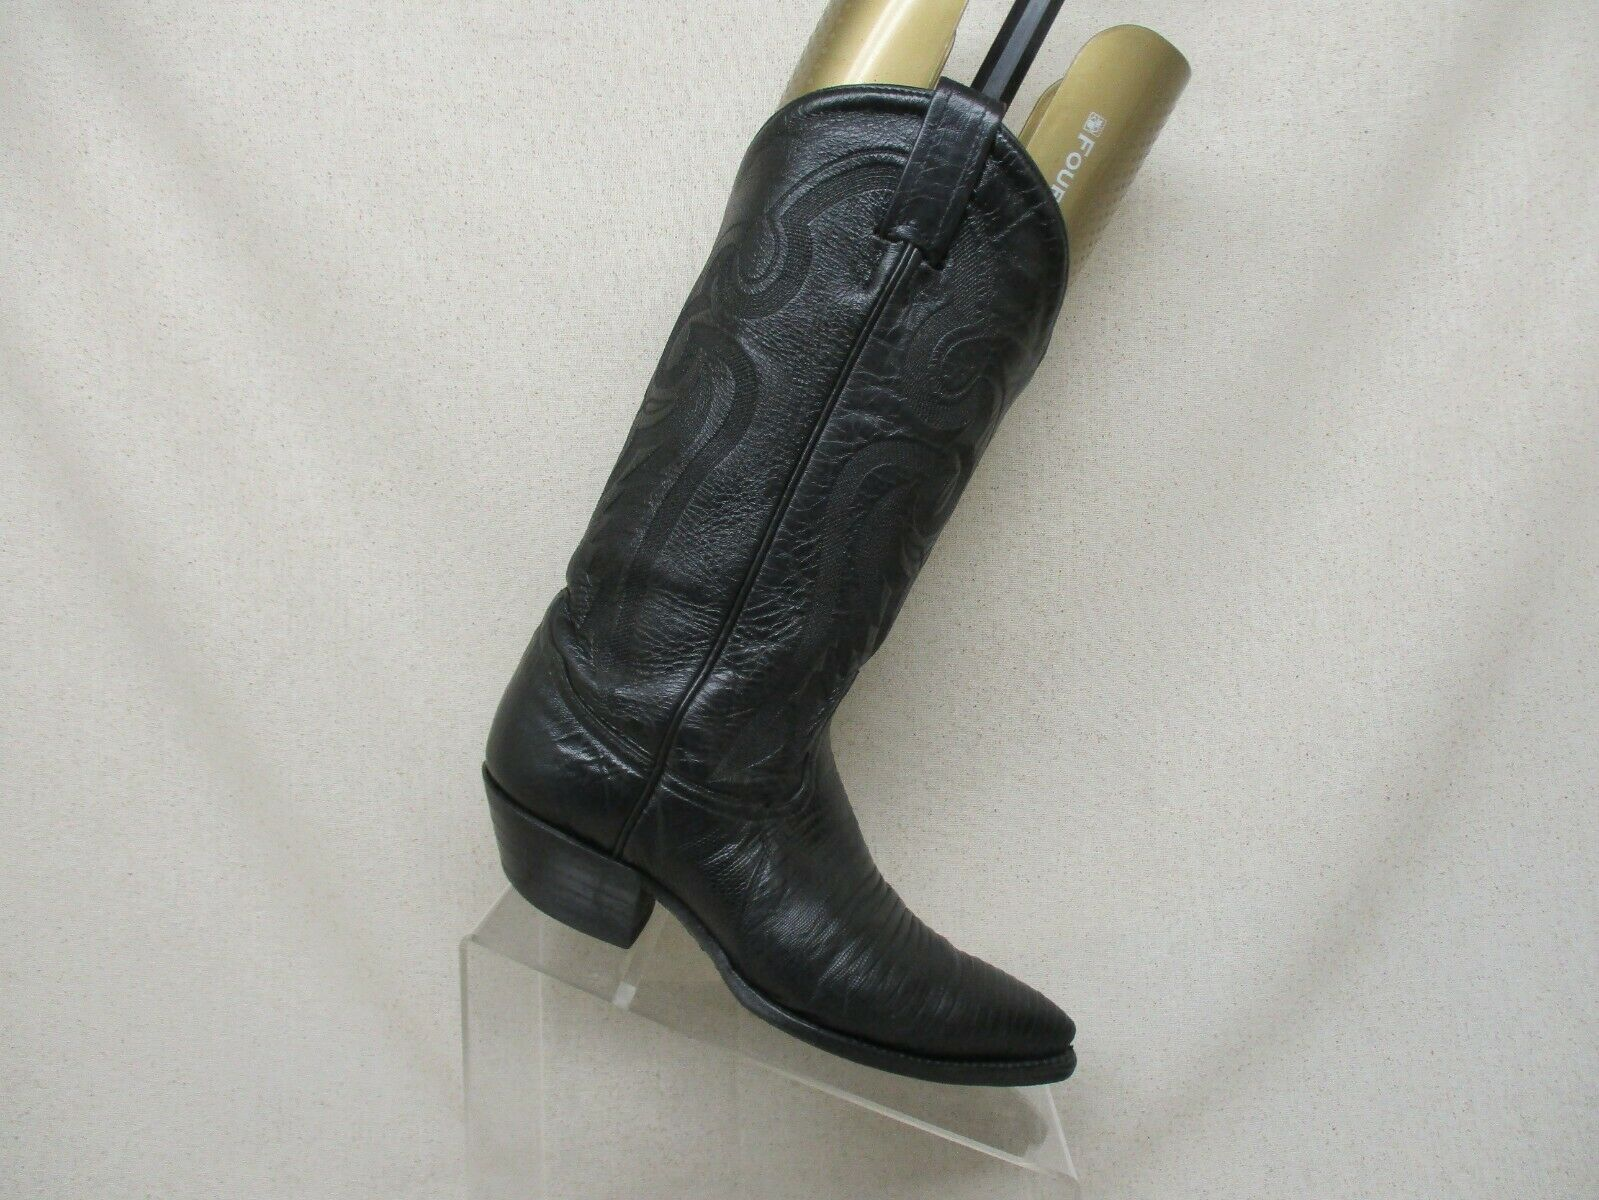 TONY LAMA nero Leather Lizard Cowboy Western stivali donna Dimensione 5 B Style 8176